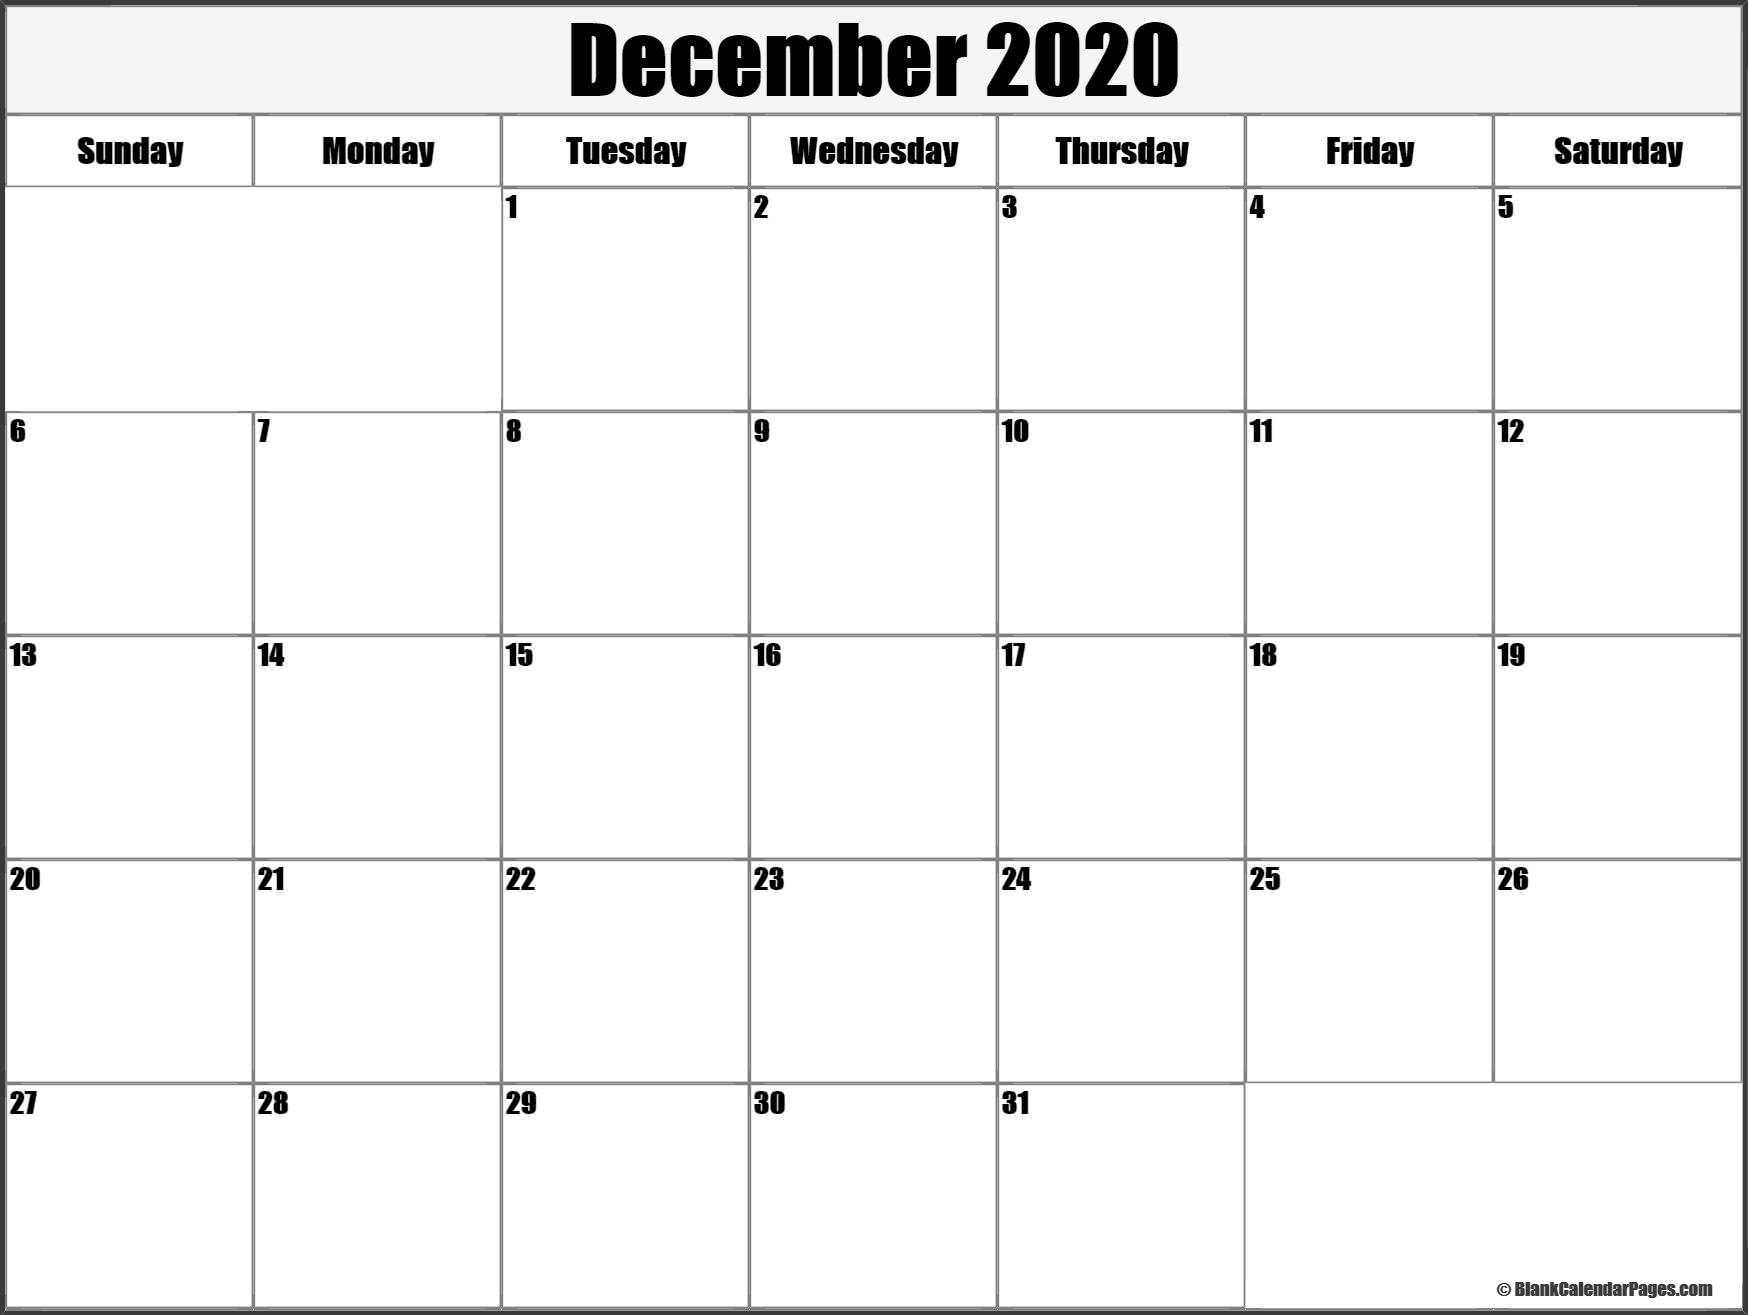 December 2020 Blank Calendar Templates.